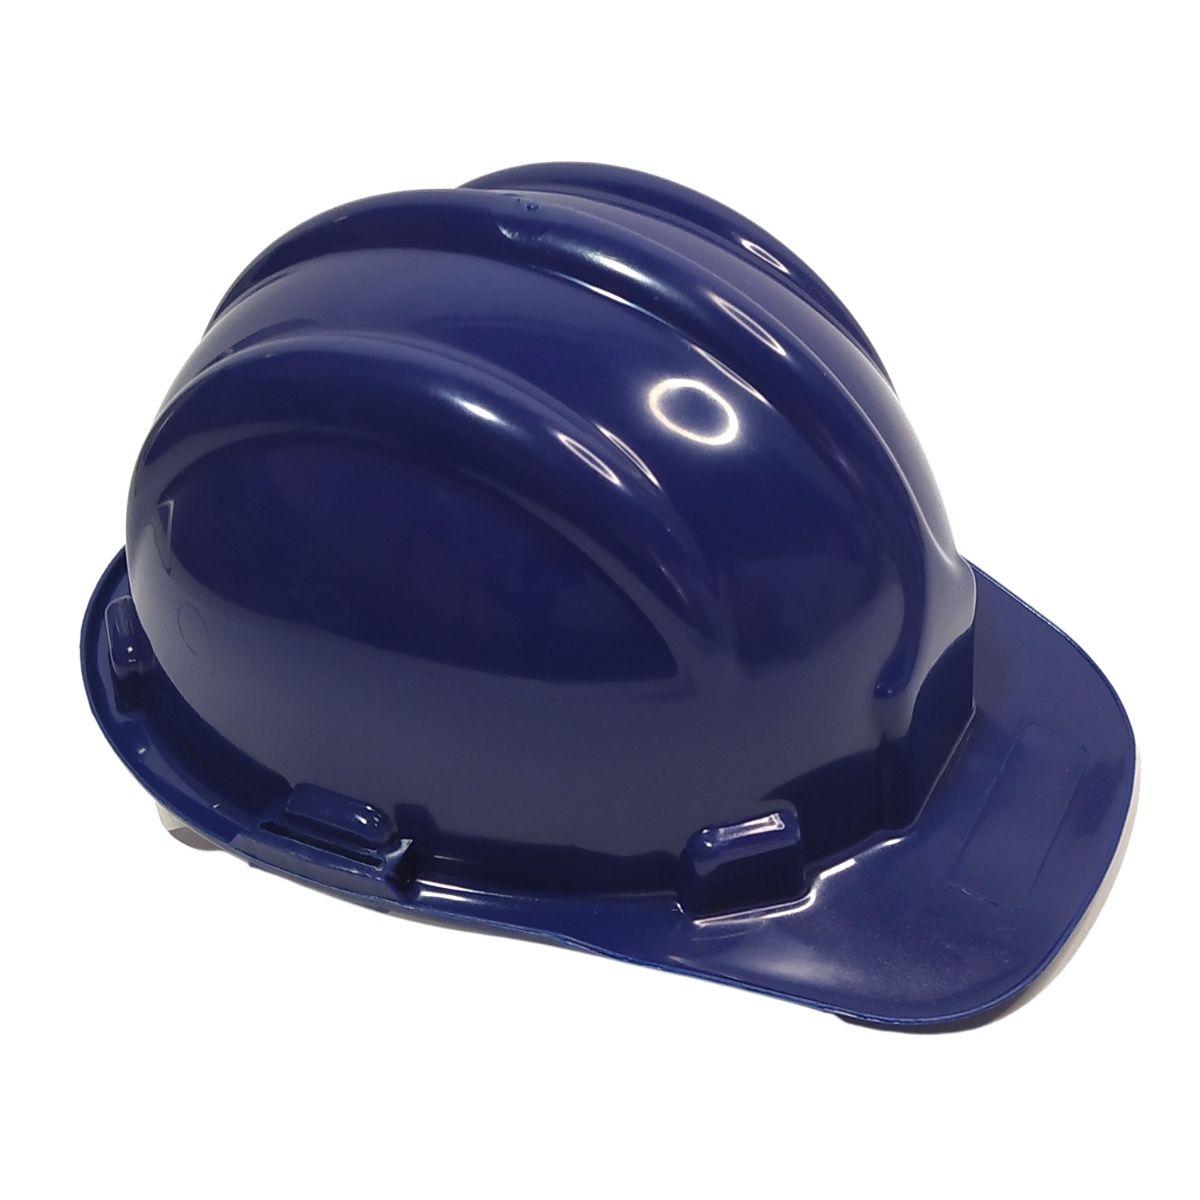 Capacete PLT C/ Selo Azul escurto